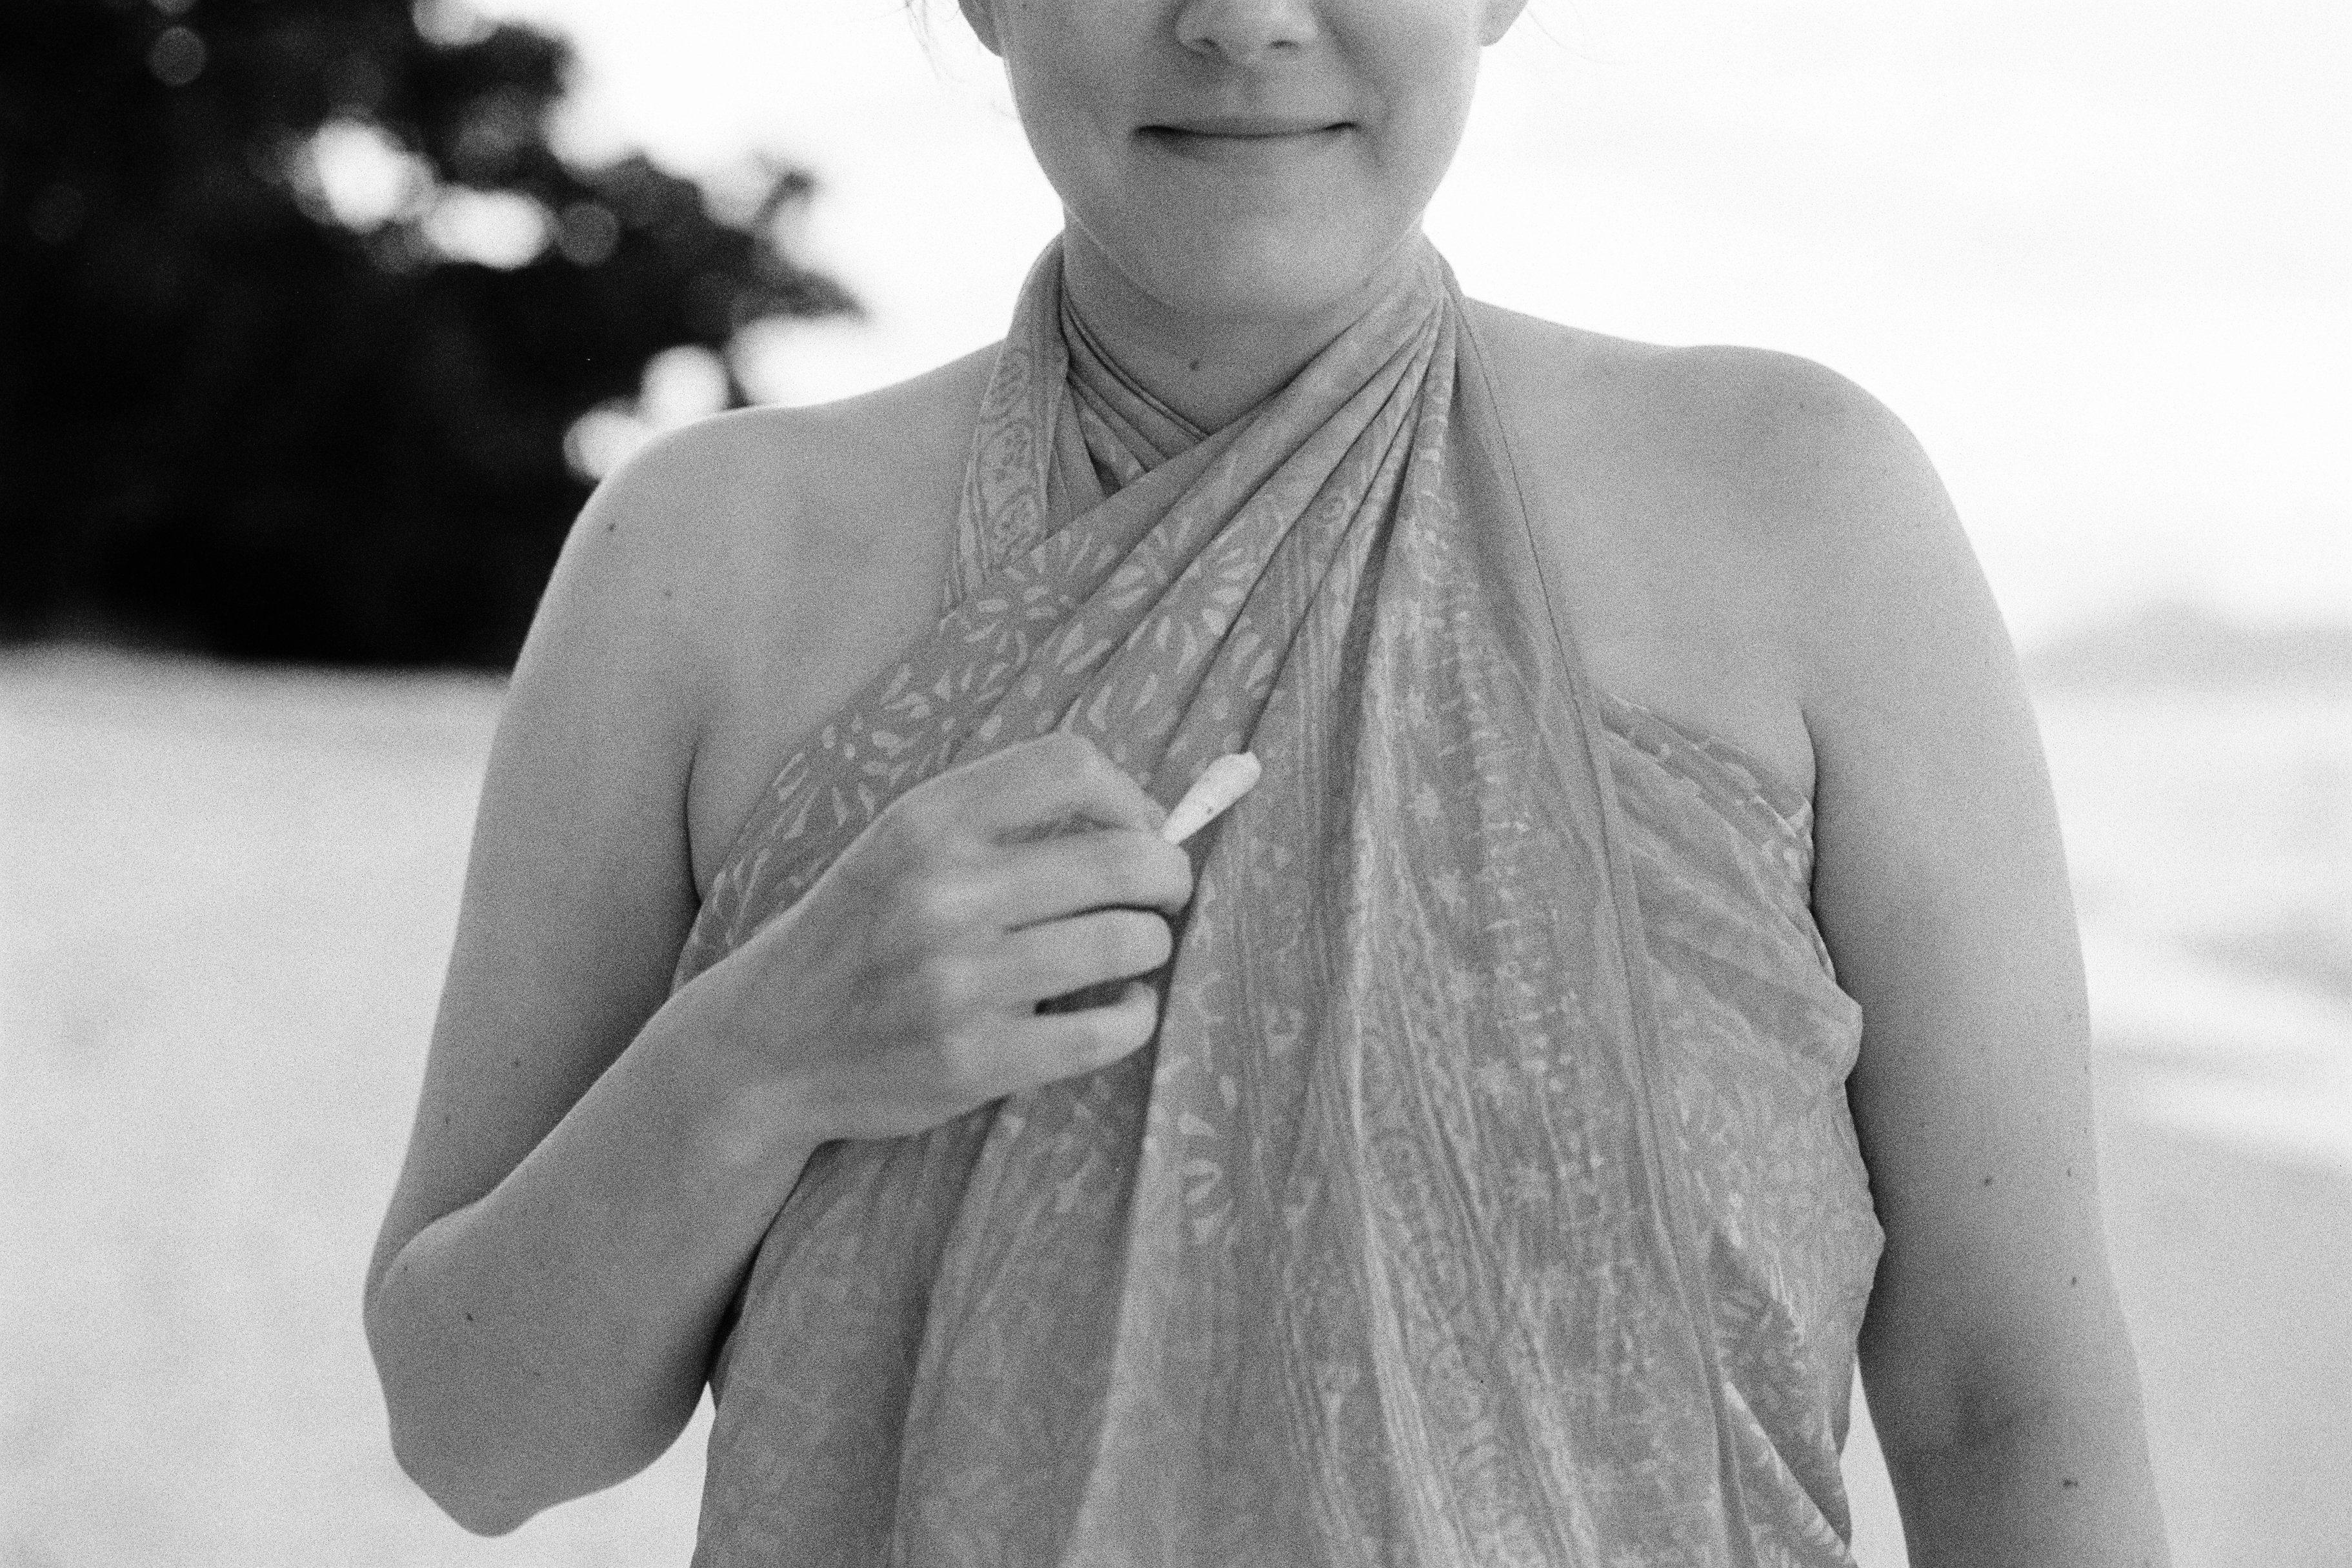 @DavyBlaker Anse La Passe, Silhouette Island, Seychelles. Shot on Ilford SFX 200 in June 2017. #smiles #ilfordphoto #fridayfavourites #ilfordsfx200 #filmphotography #believeinfilm #photography #shootfilmbenice #filmisnotdead